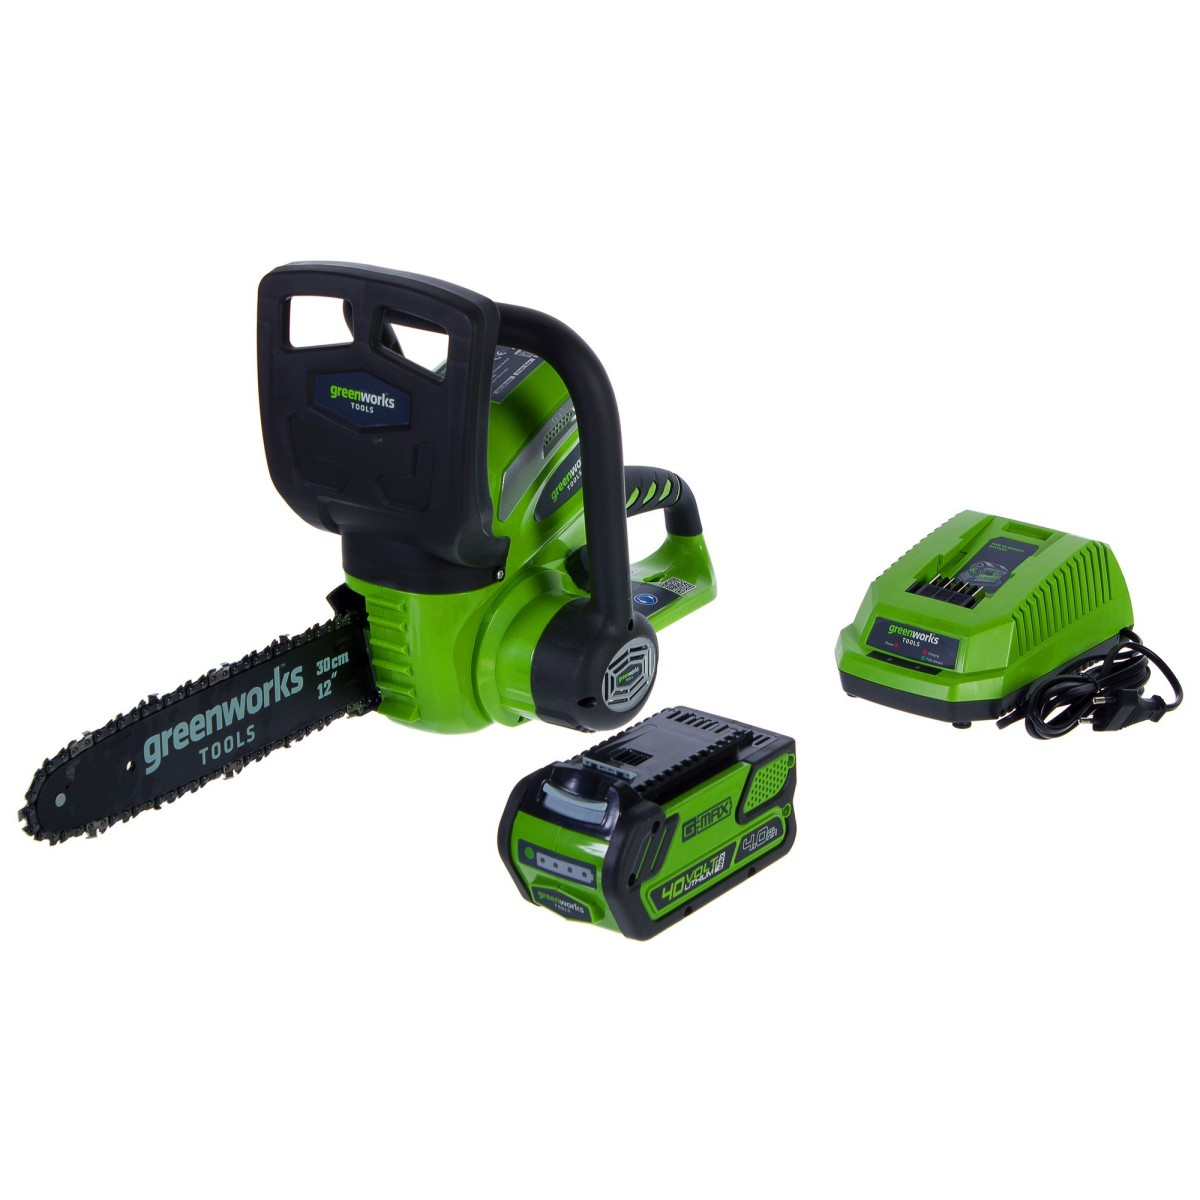 Пила цепная аккумуляторная GreenWorks 40 В шина 30 см зарядка и аккумулятор в комплекте